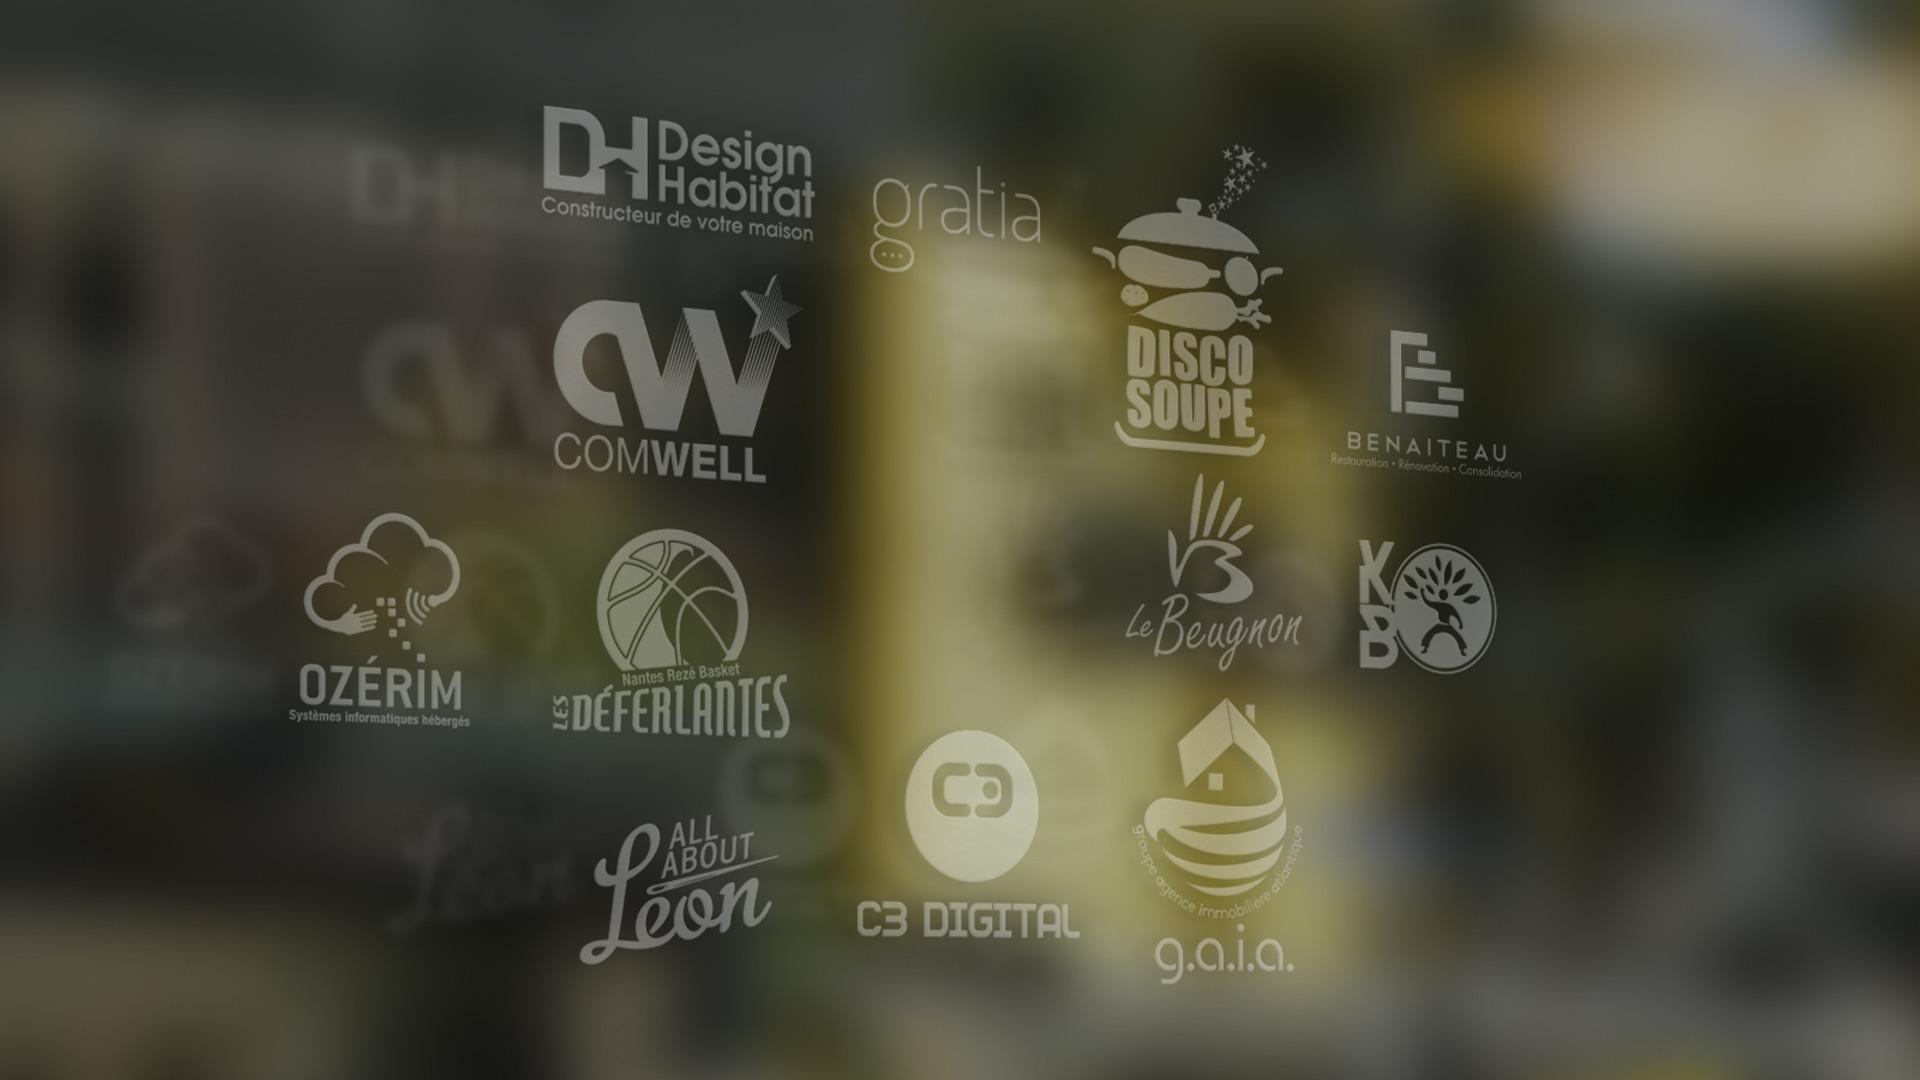 alaka graphiste nantes identité logo charte graphique